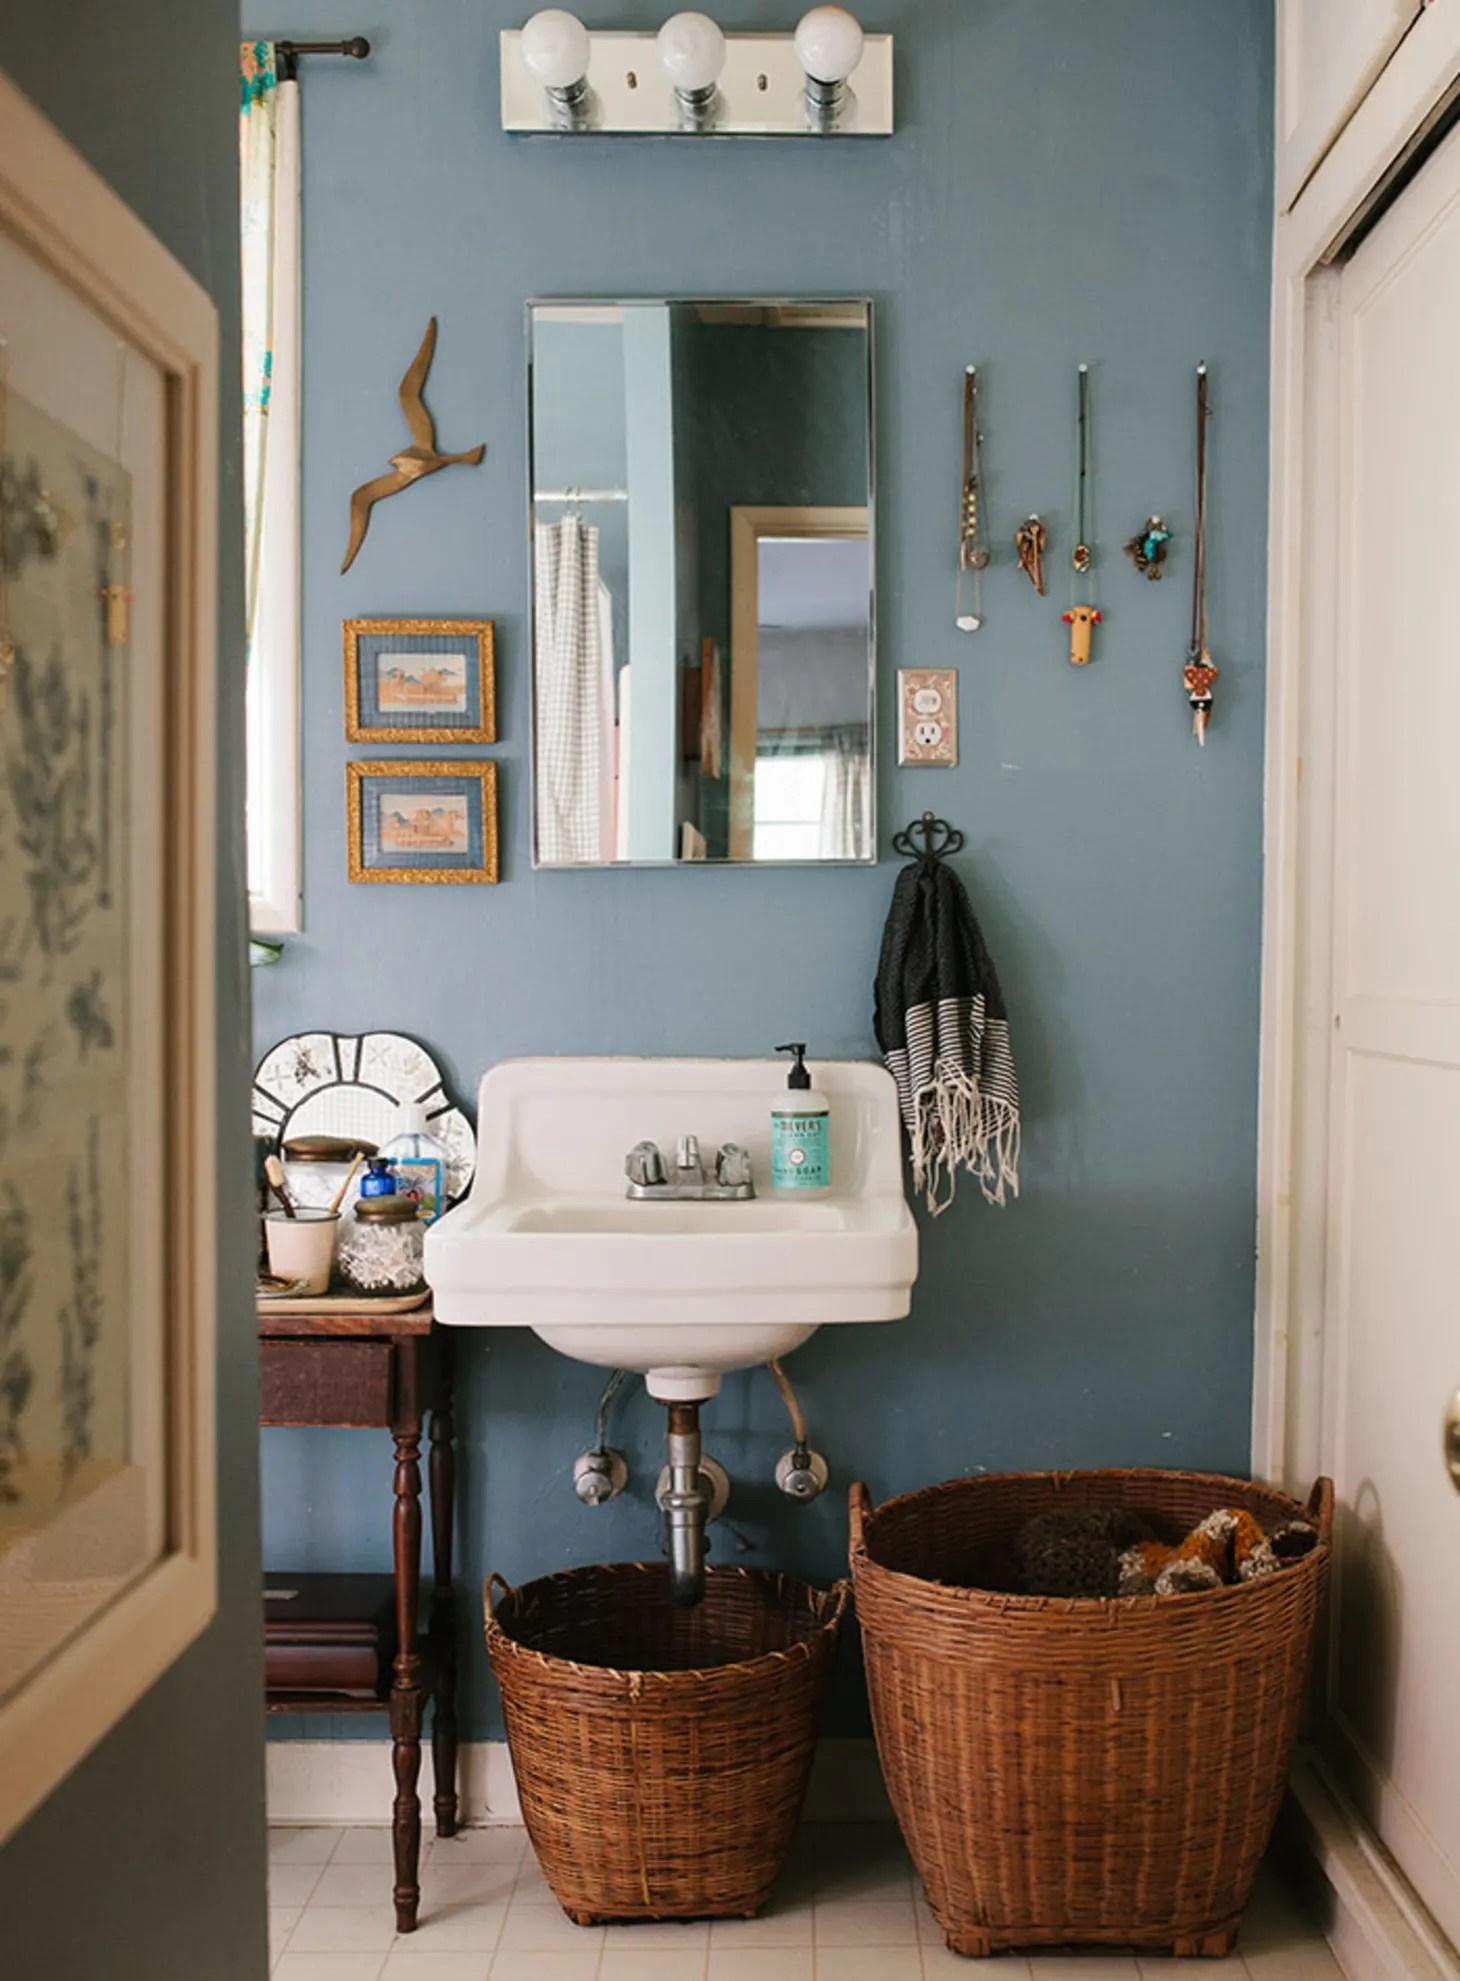 Easy Reversible Design Ideas for Rental Bathrooms ... on Apartment Bathroom Ideas  id=28193